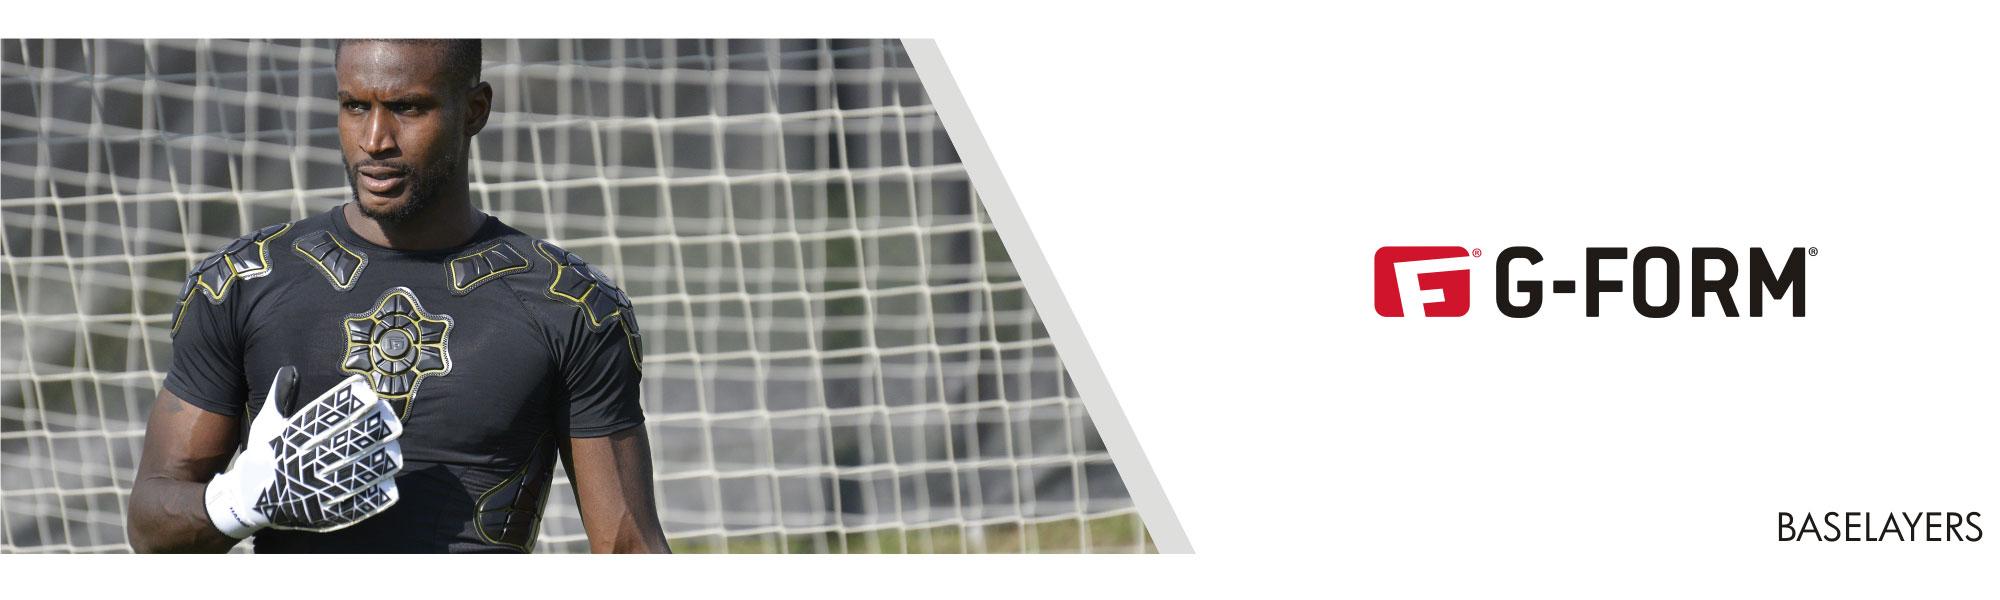 G-Form padded goalkeeper base layer shirt